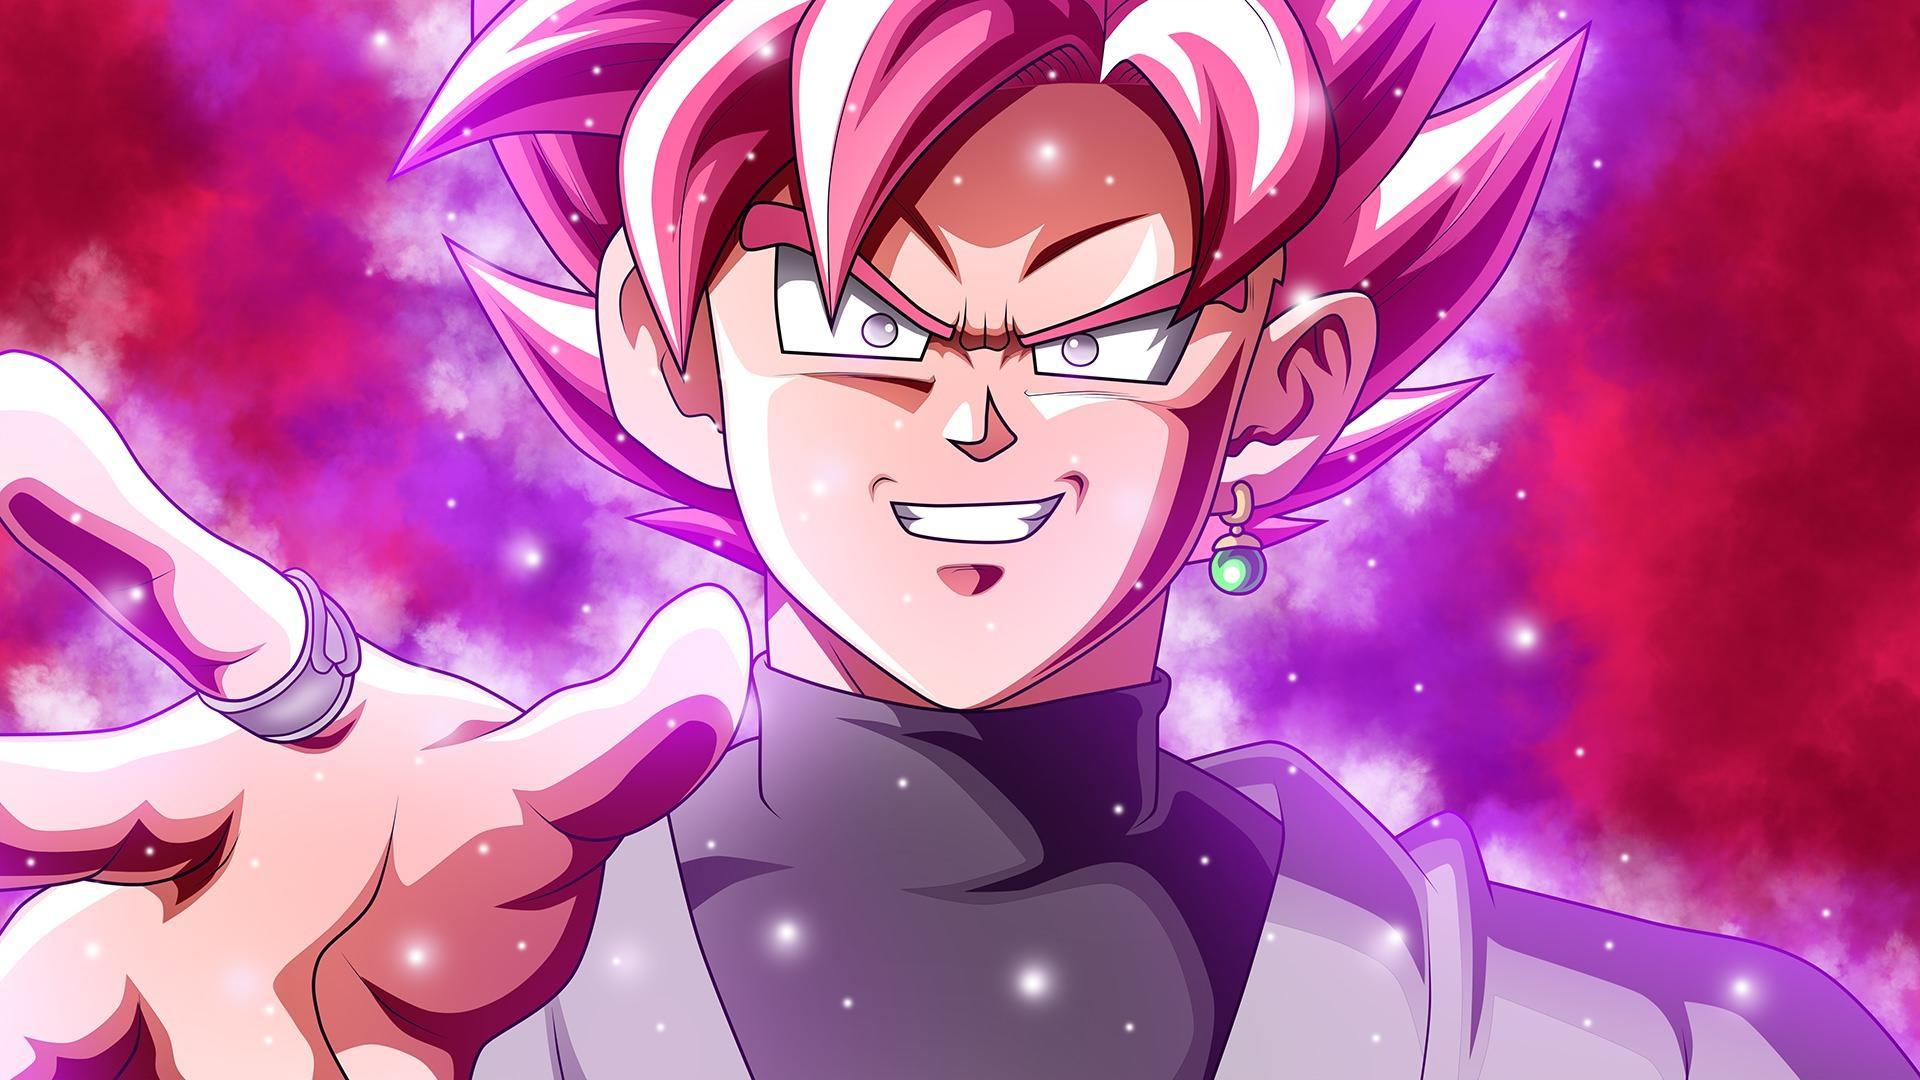 Black Goku Rose Wallpapers Top Free Black Goku Rose Backgrounds